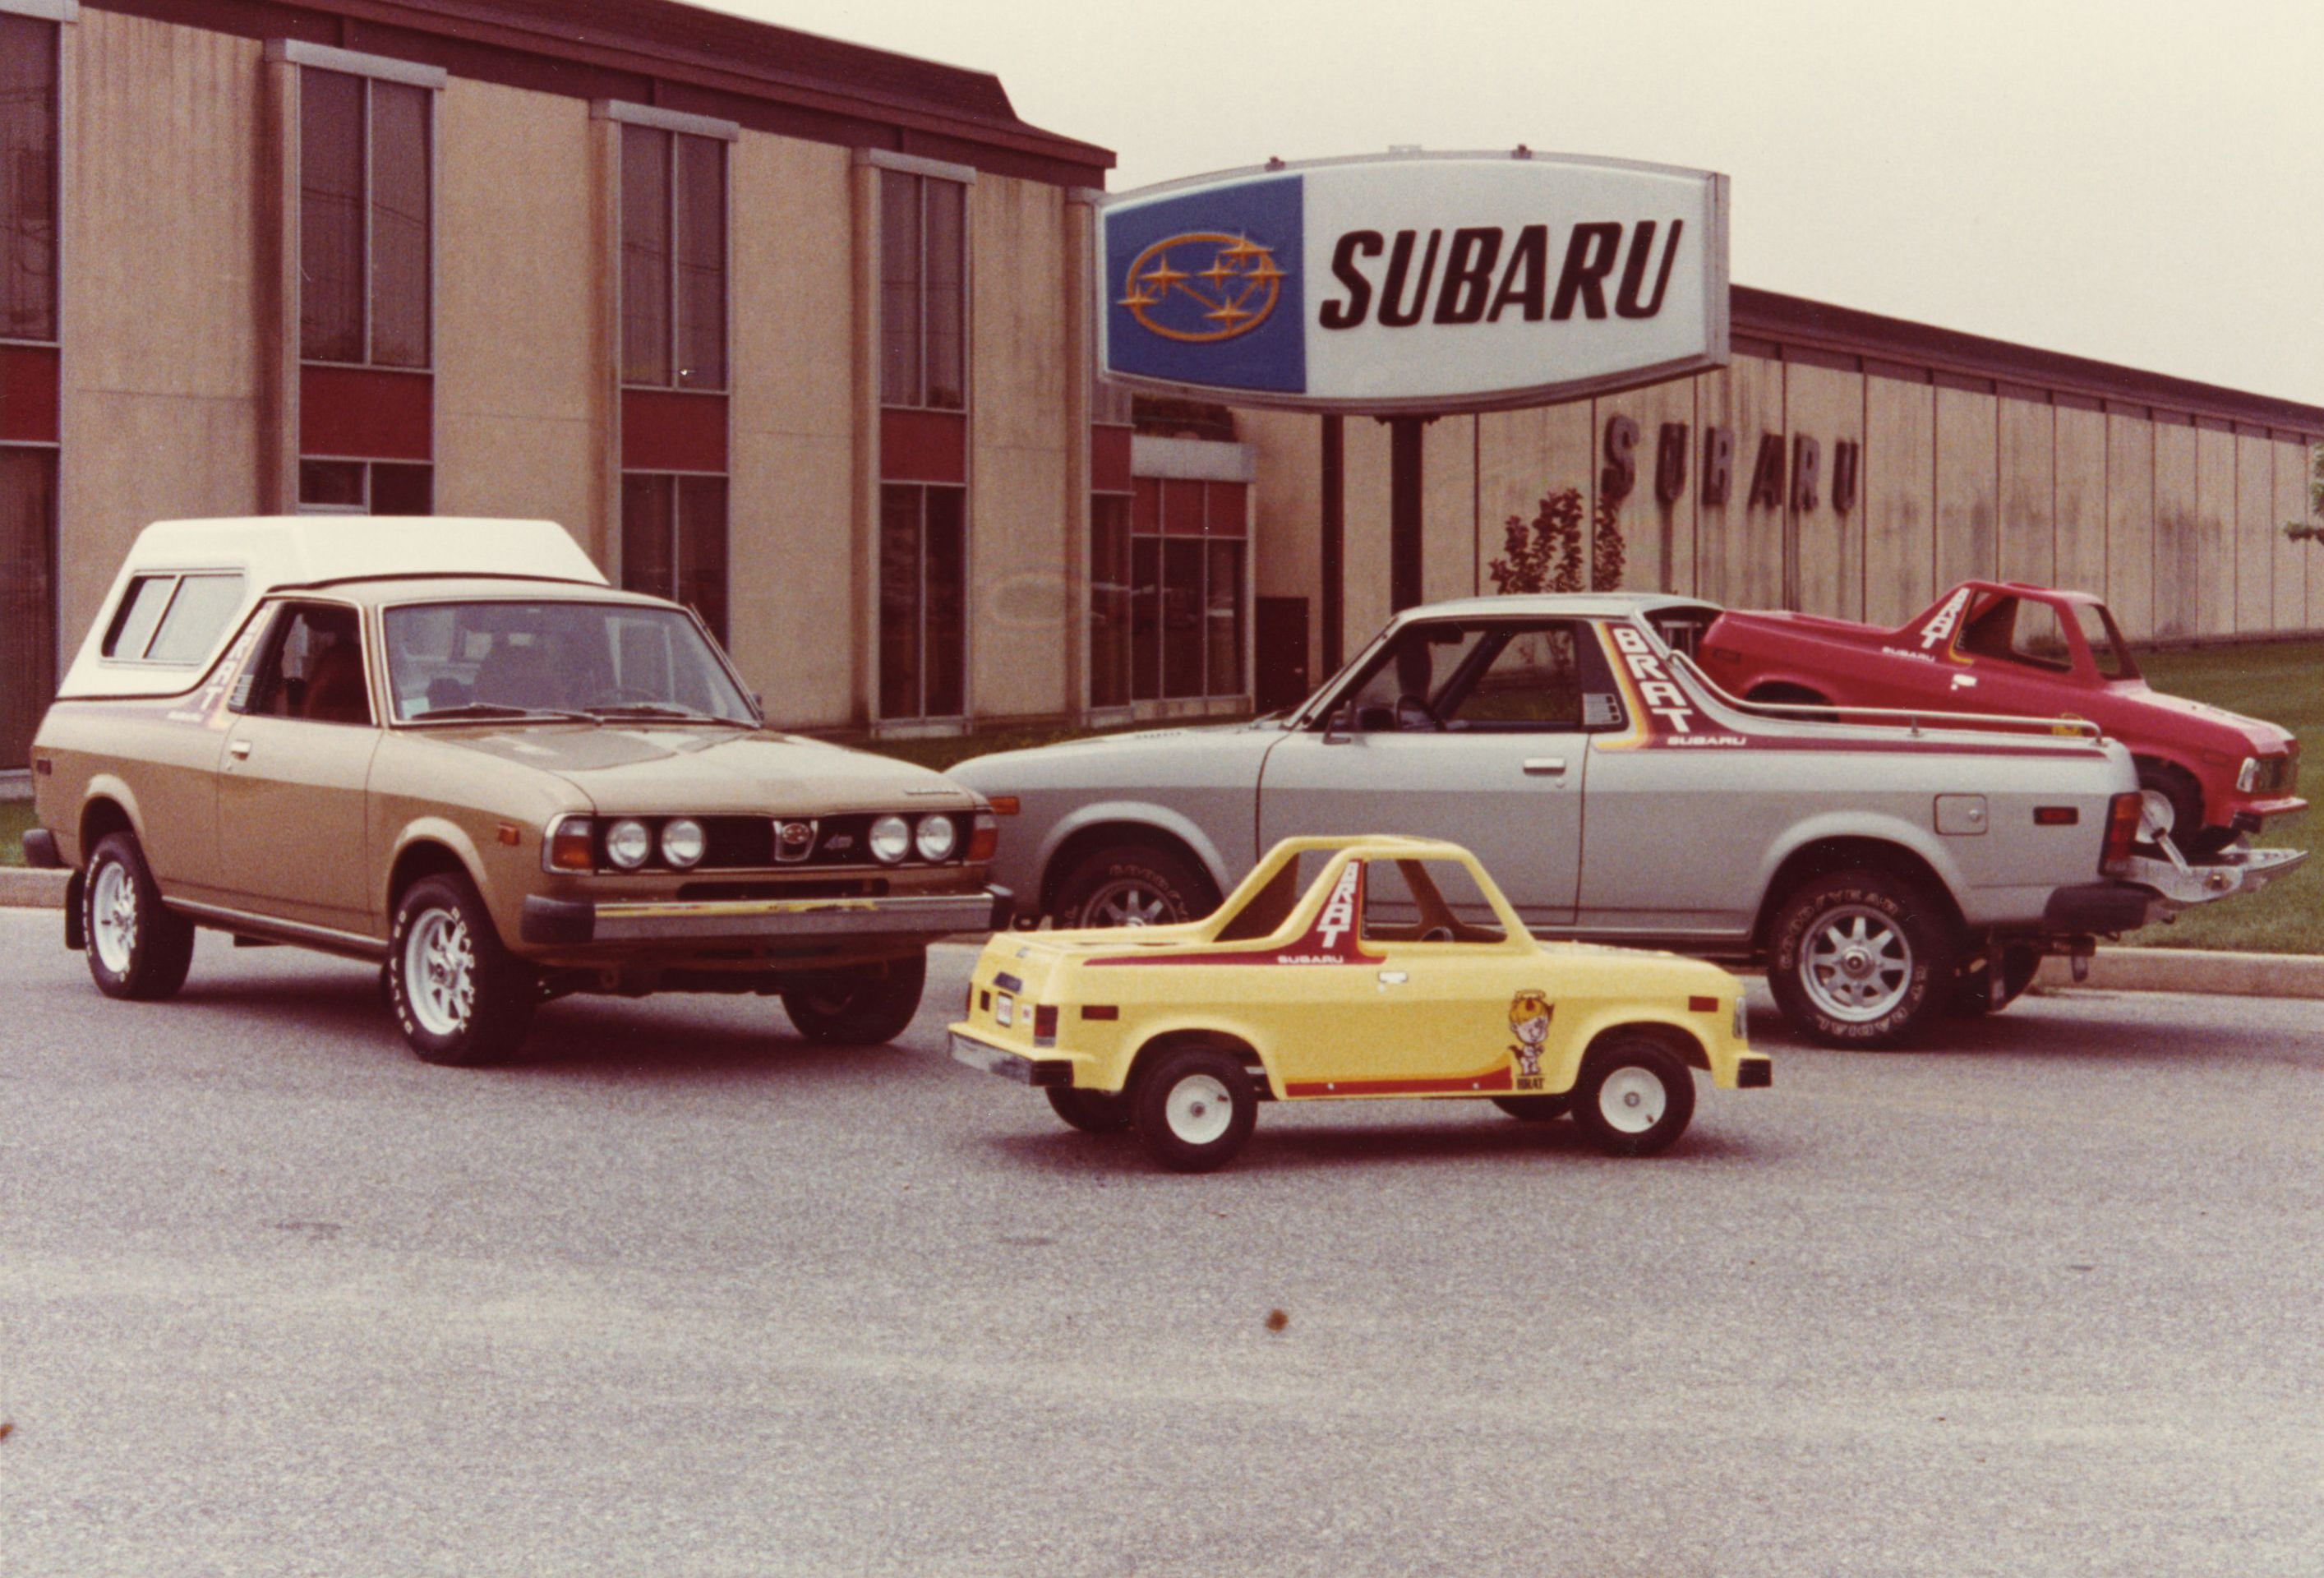 Subaru BRAT lineup